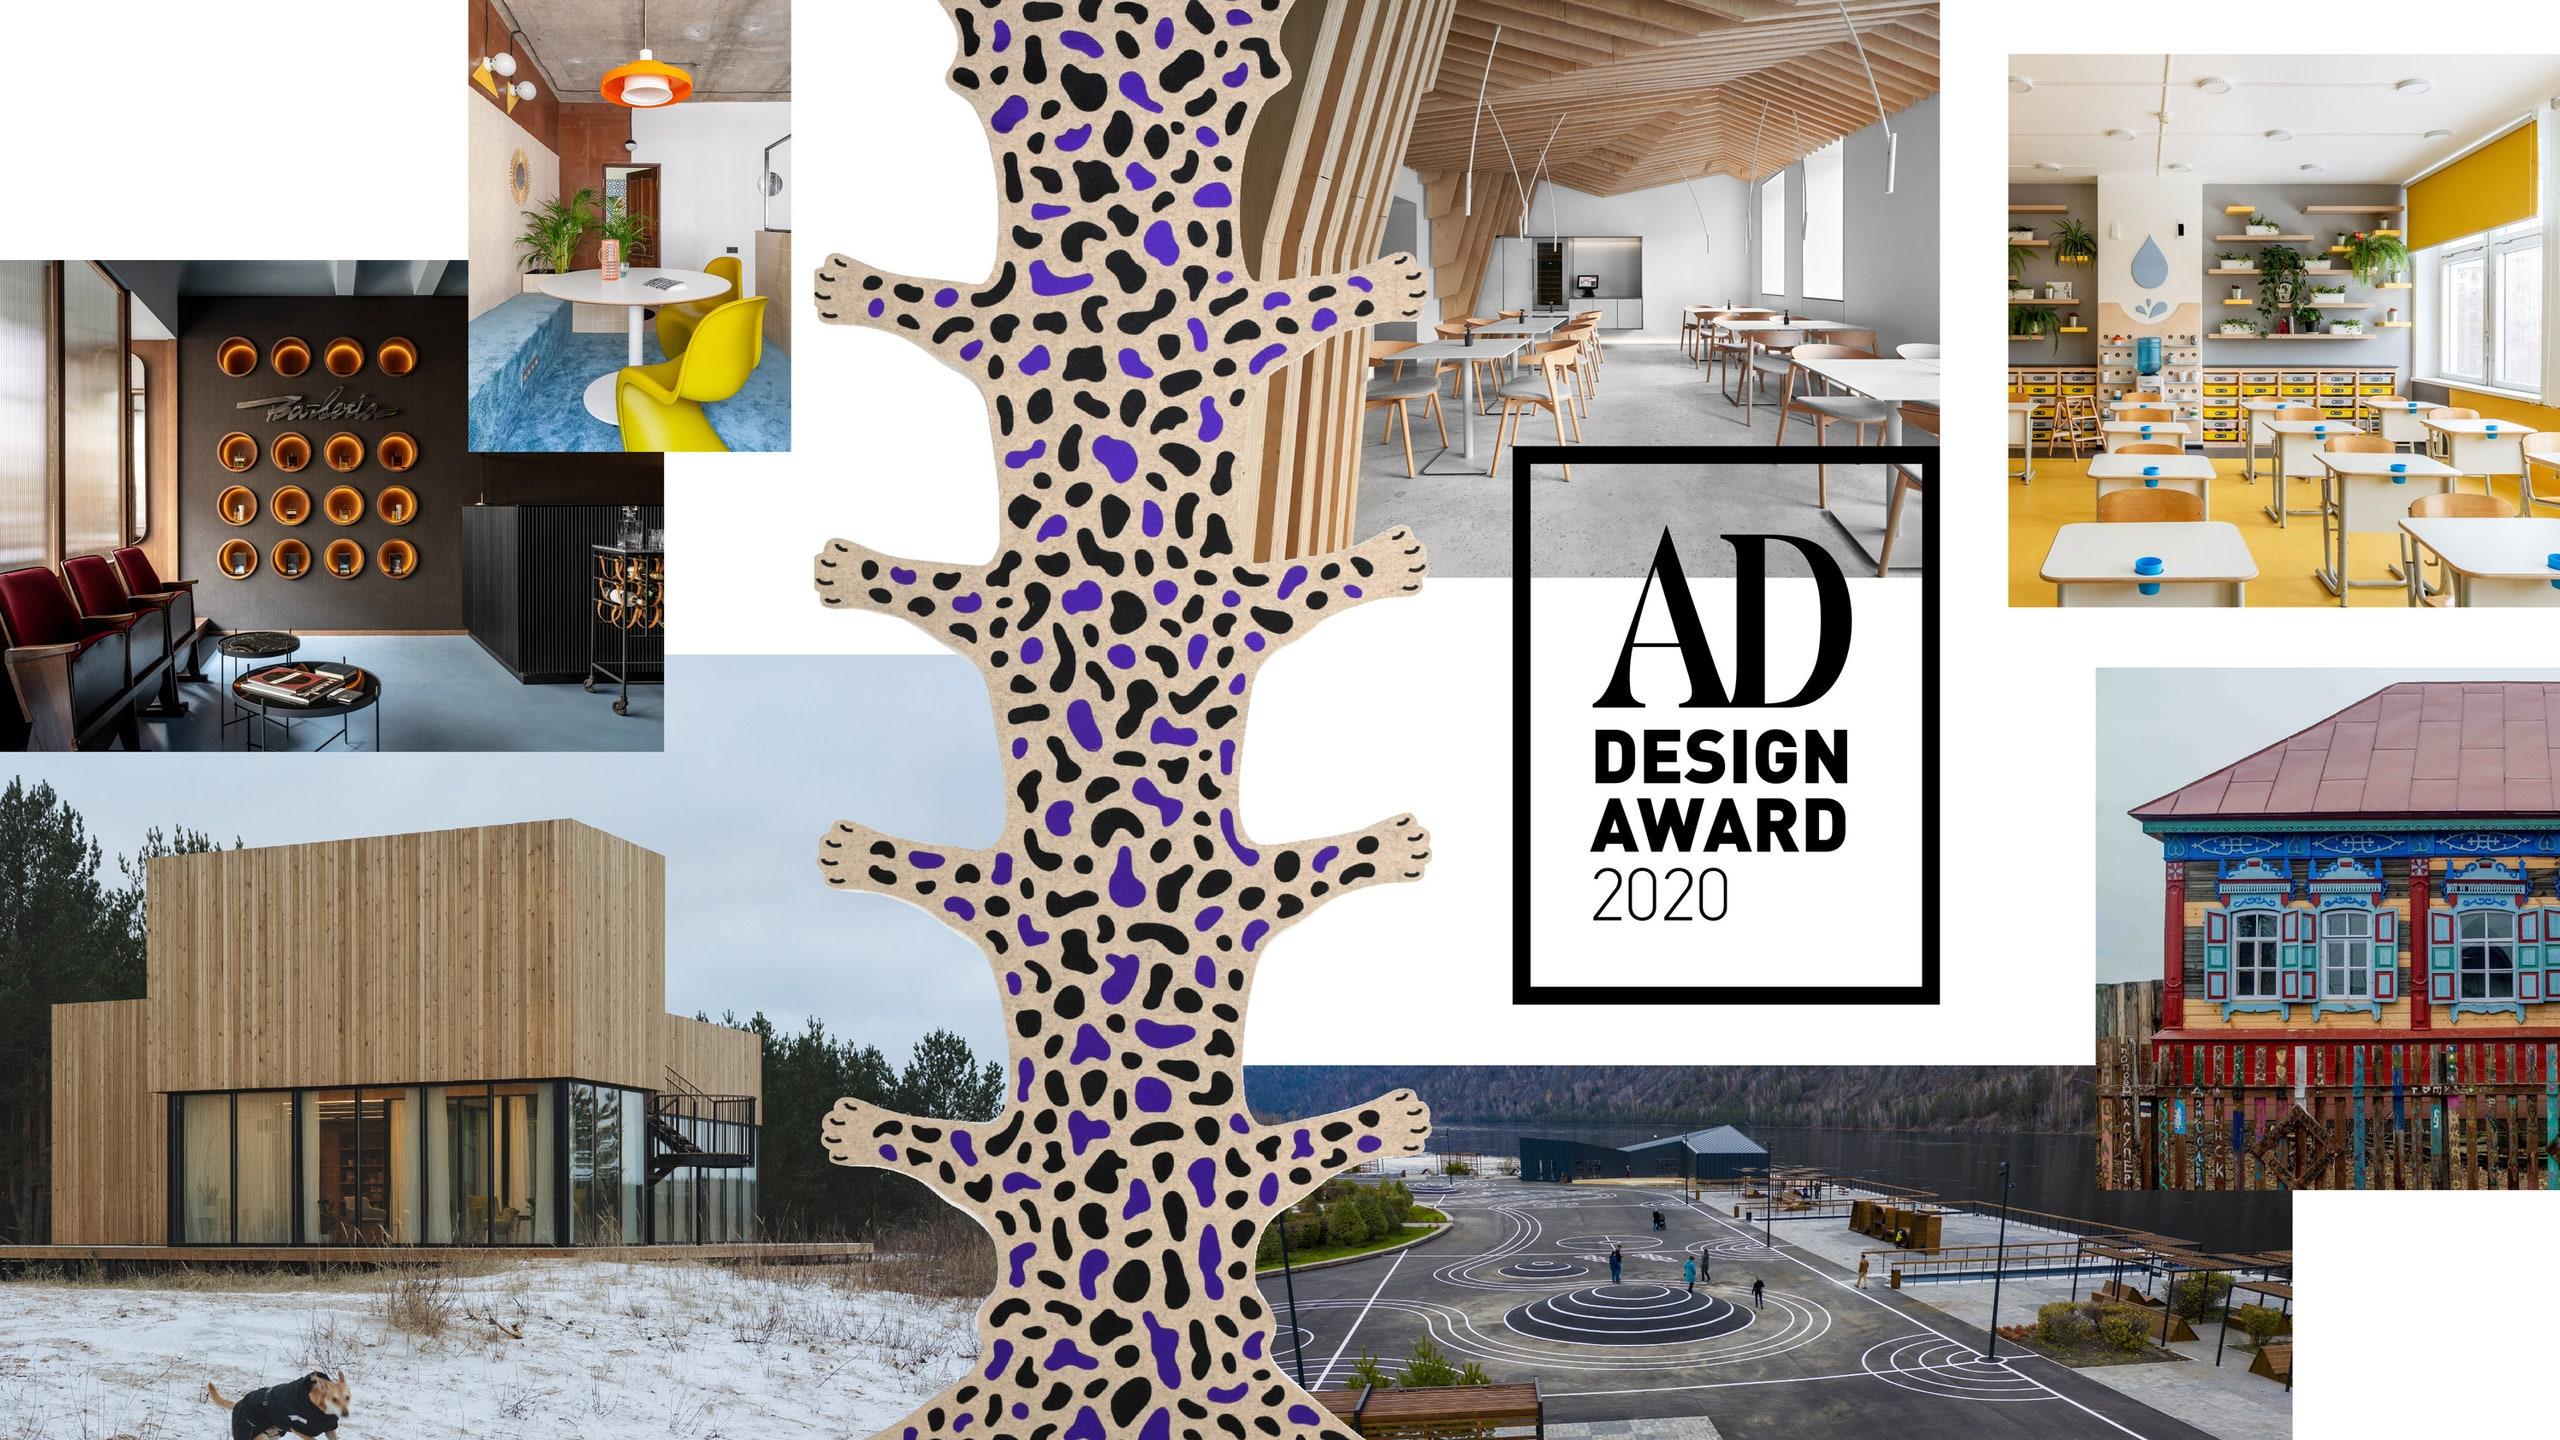 AD Design Award 2020 10